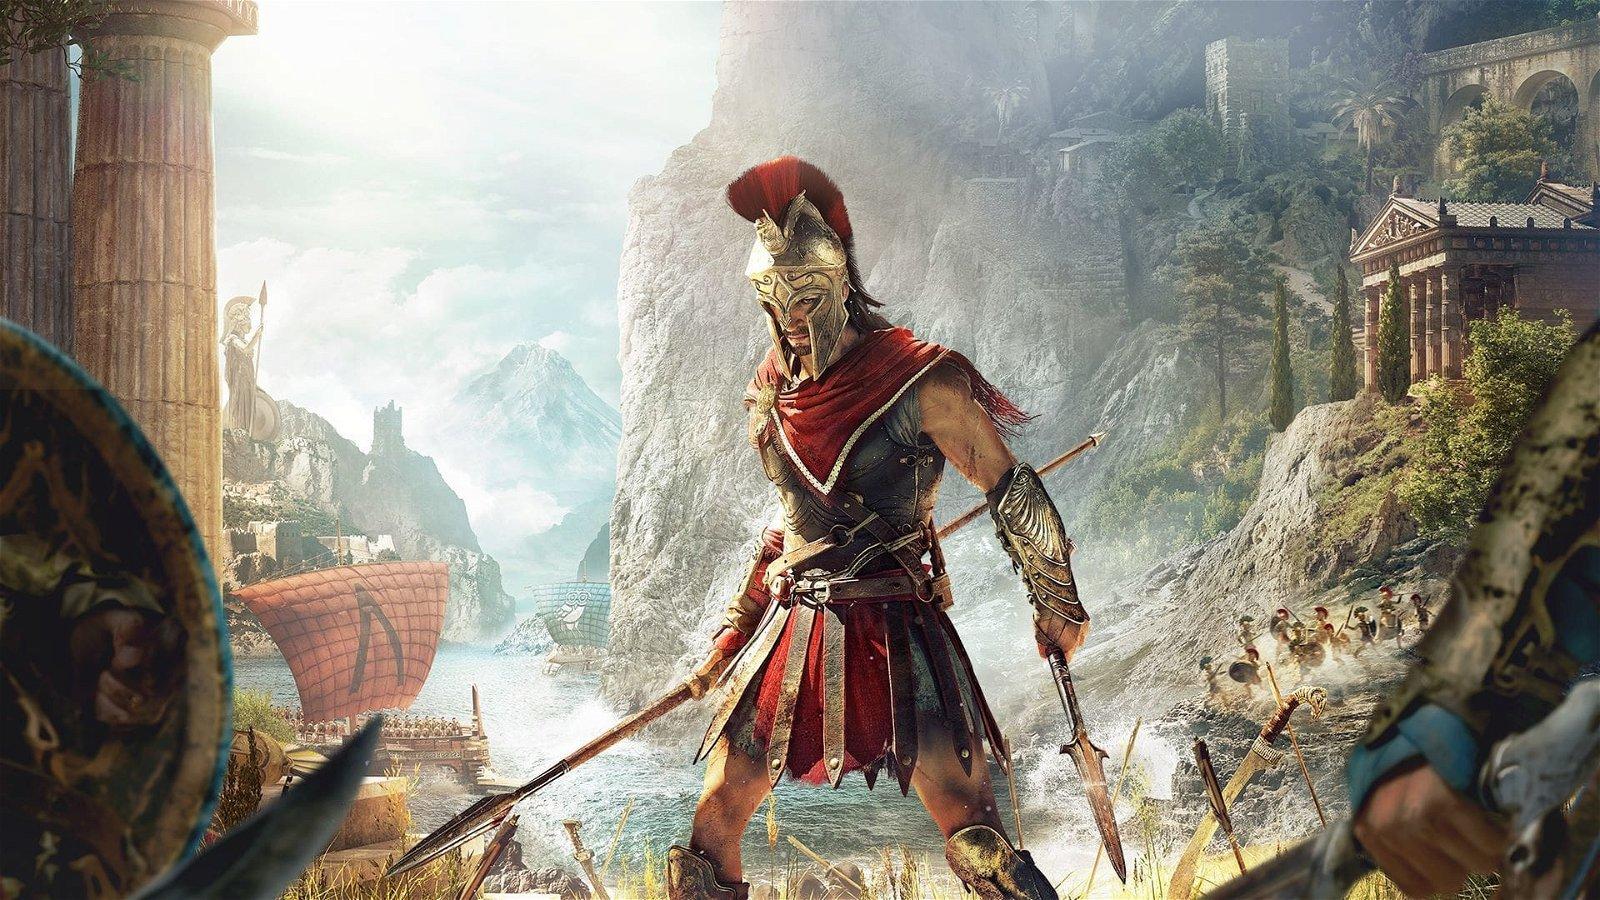 Assassin's Creed Odyssey Free in Response to Coronavirus 2